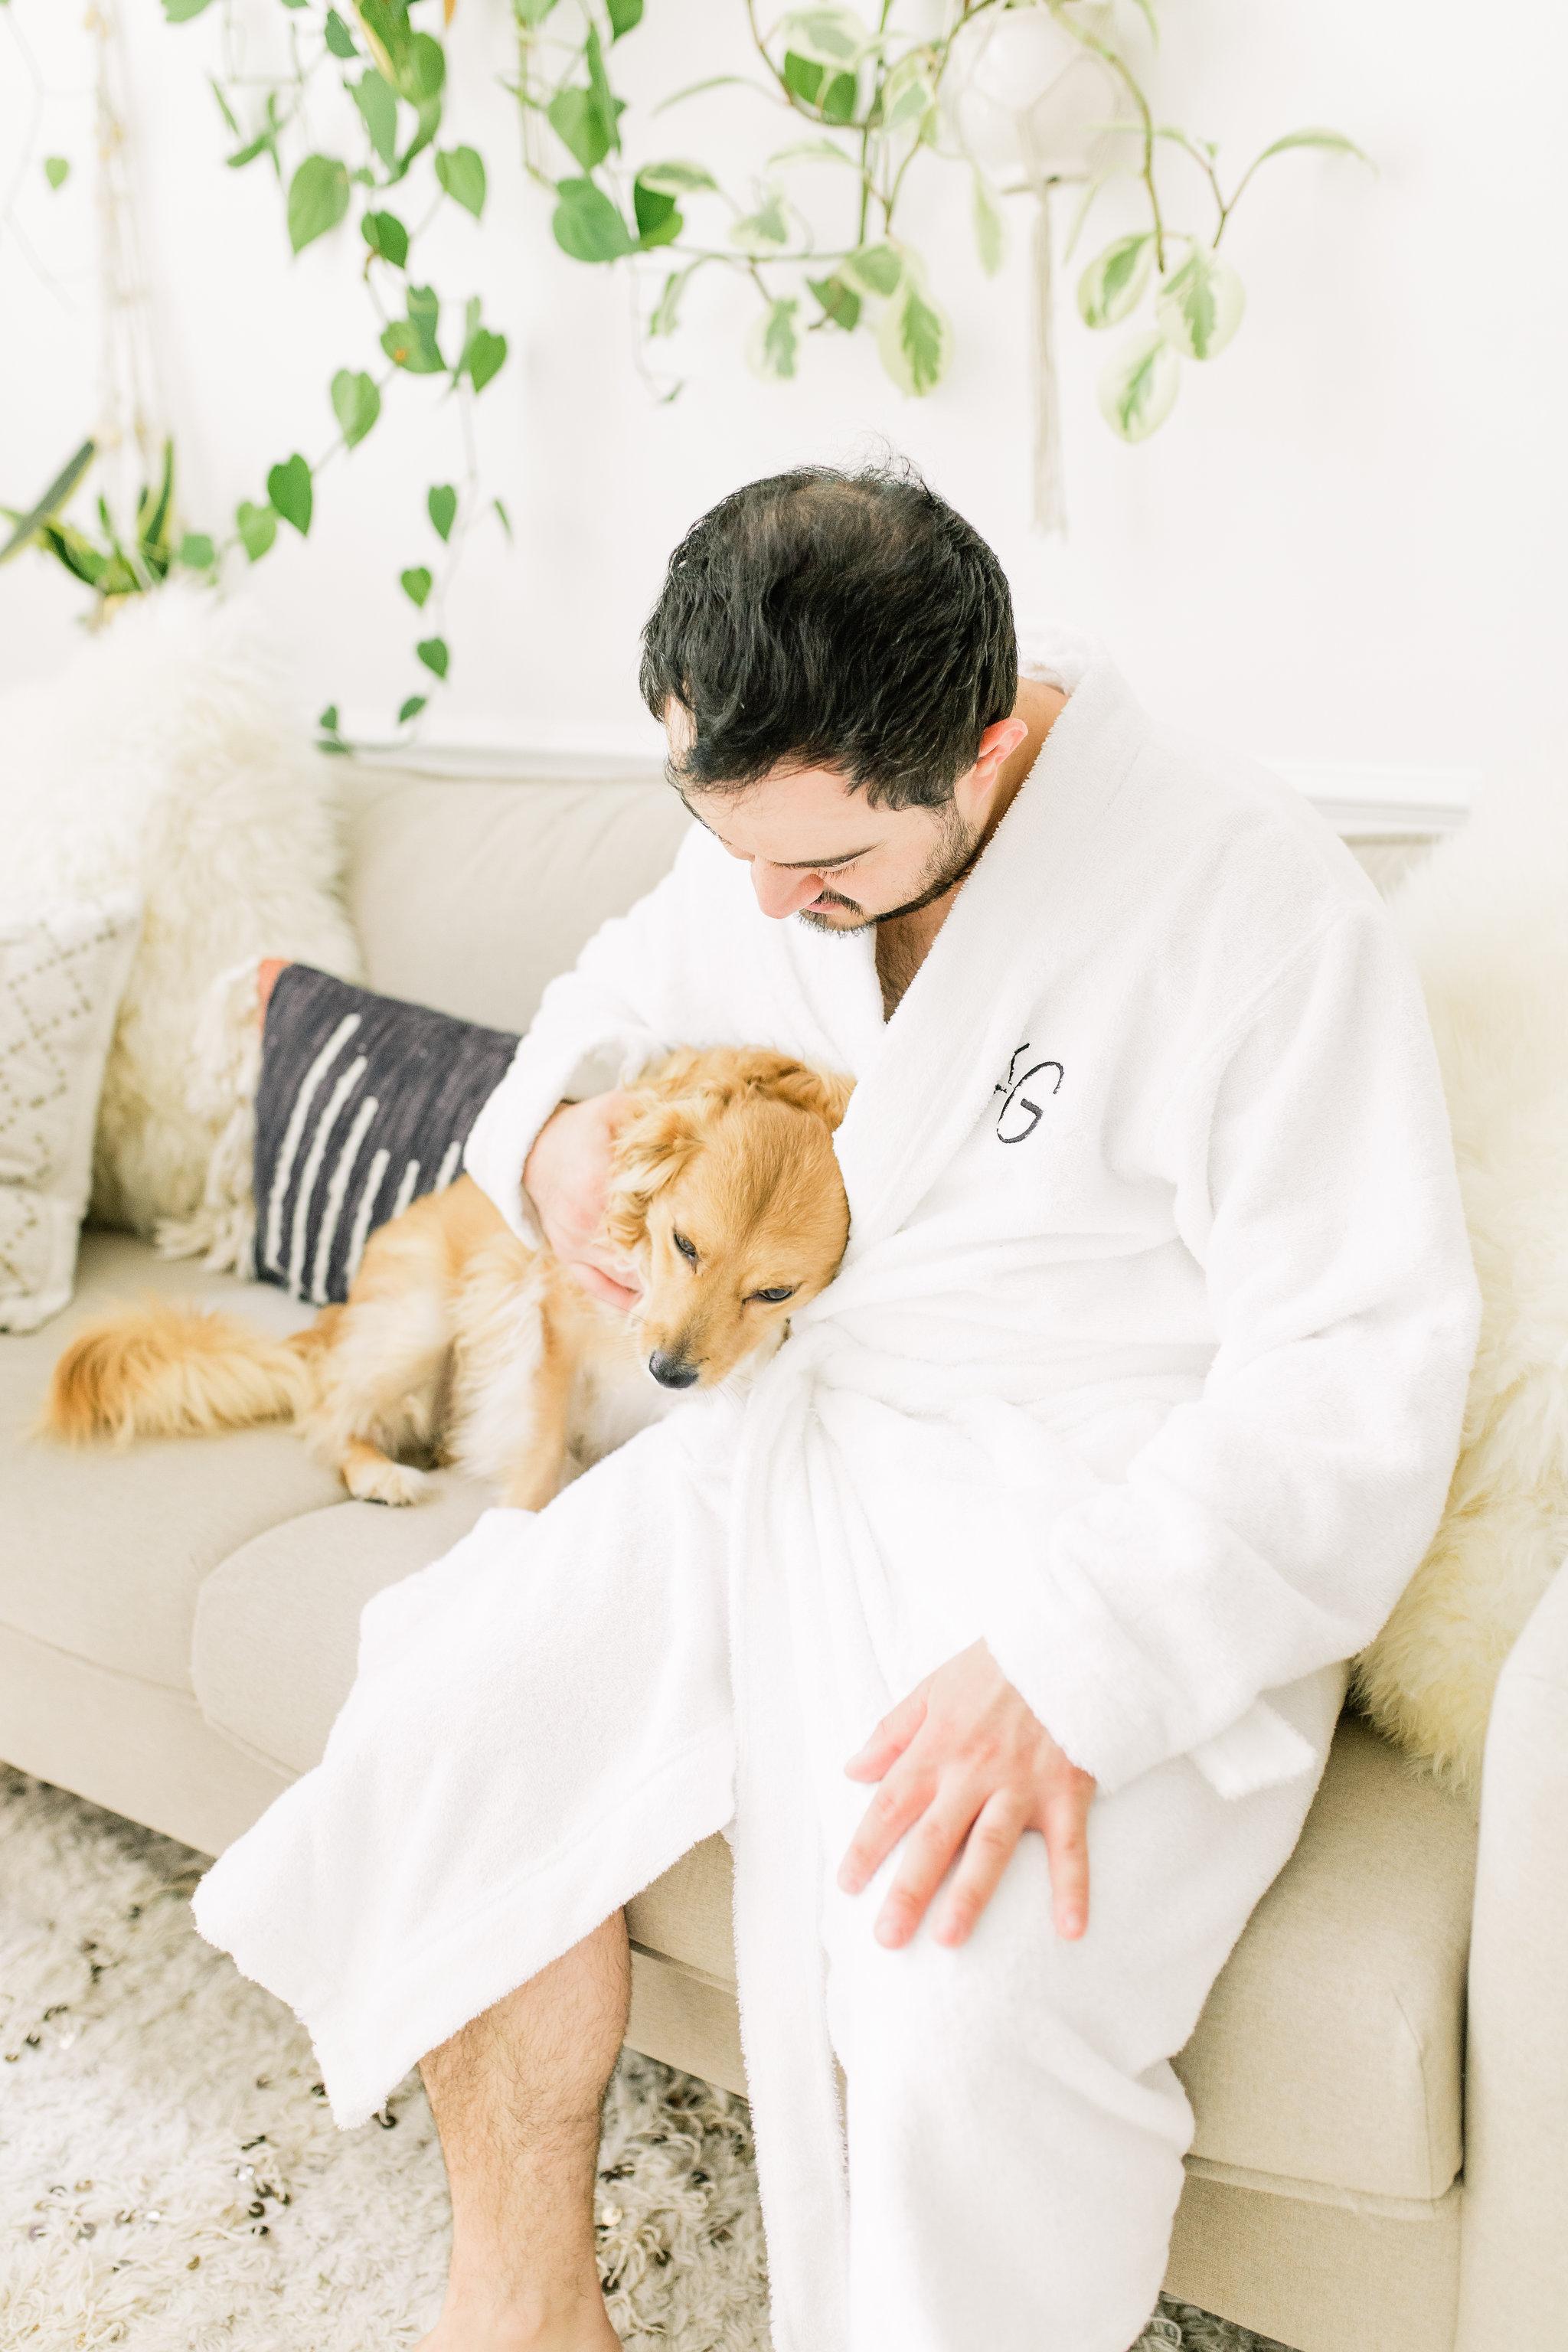 Joyfullygreen The Company Store Unisex White Fluffy Robe Monogramed Father's Day Gift Idea. Mens Robes.jpg